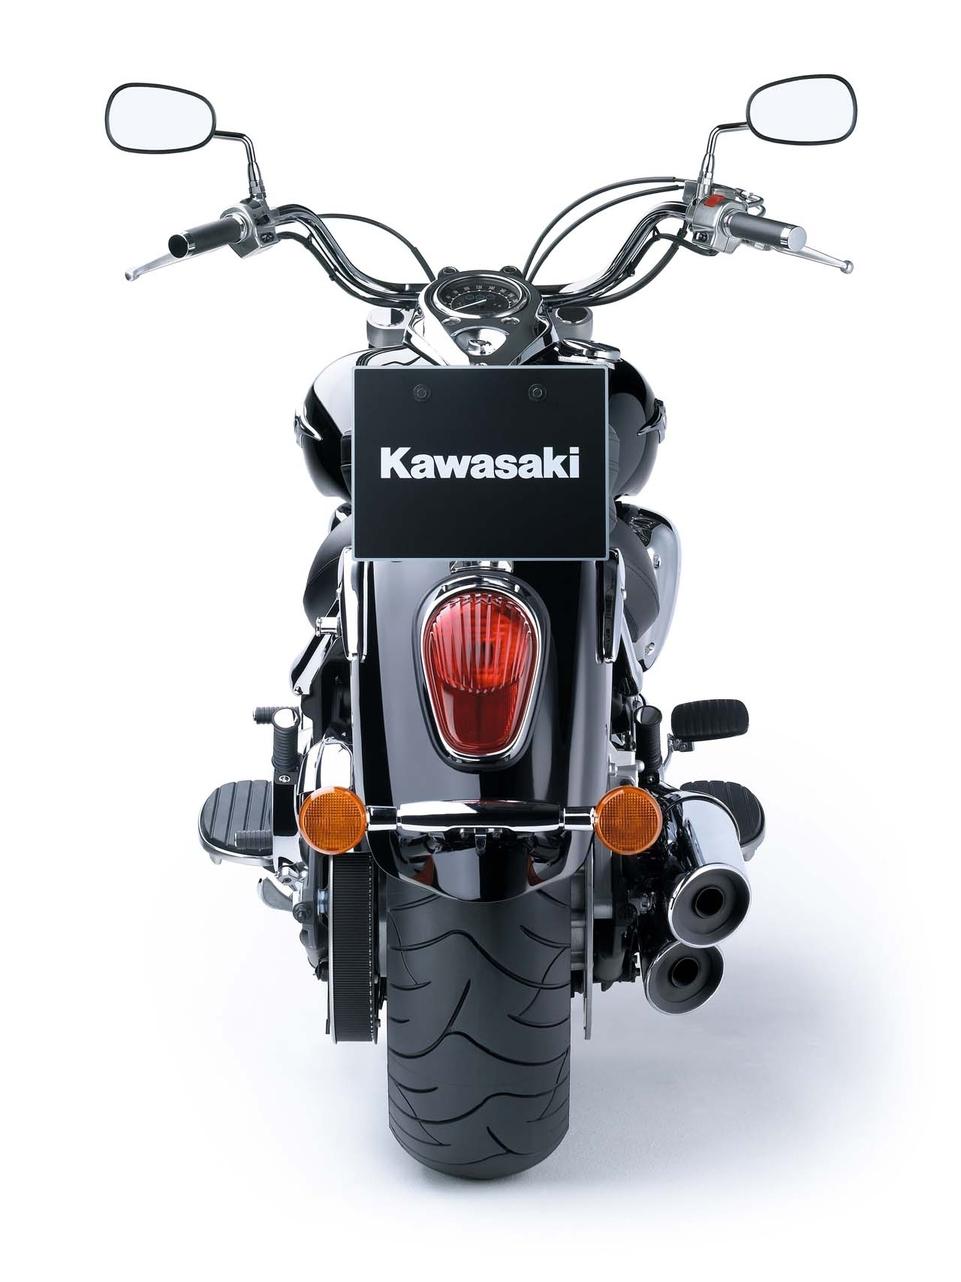 Nouveauté 2008 : Kawasaki VN2000 Classic